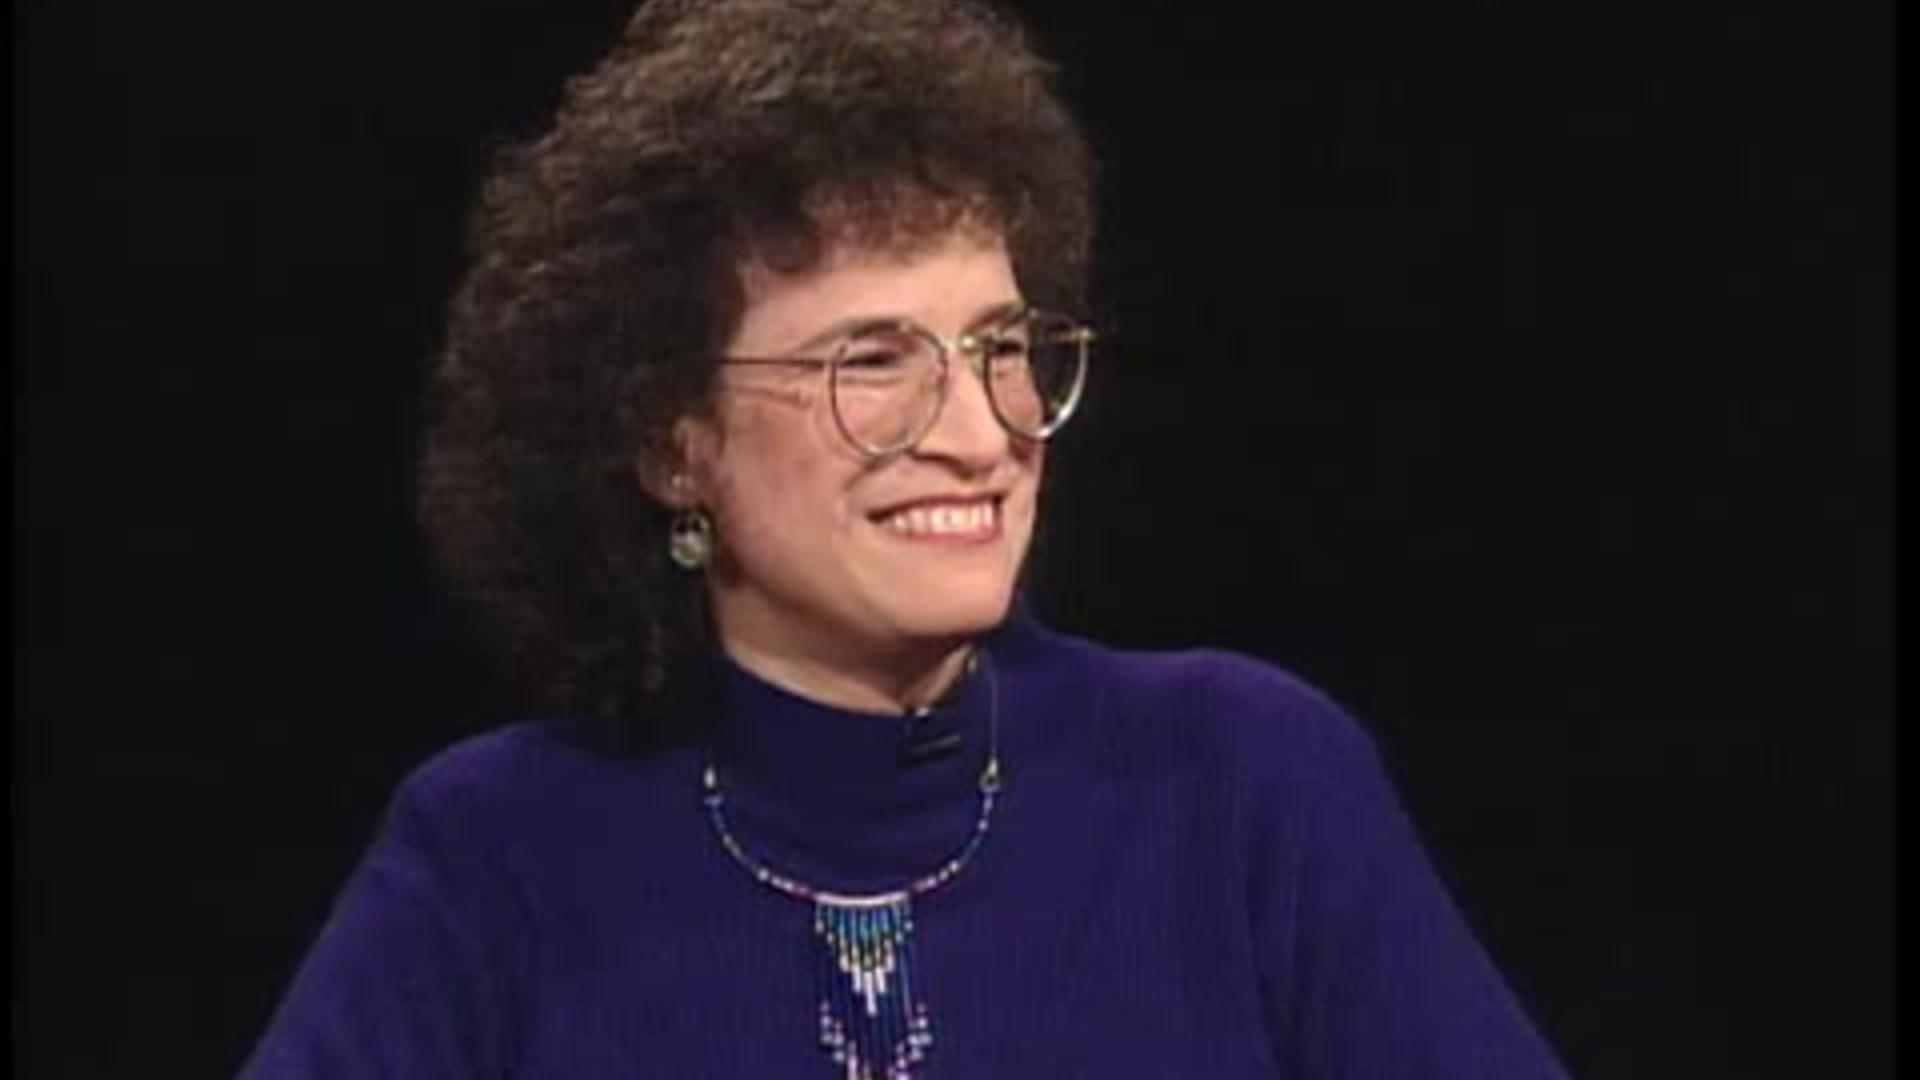 Margaret J. Geller